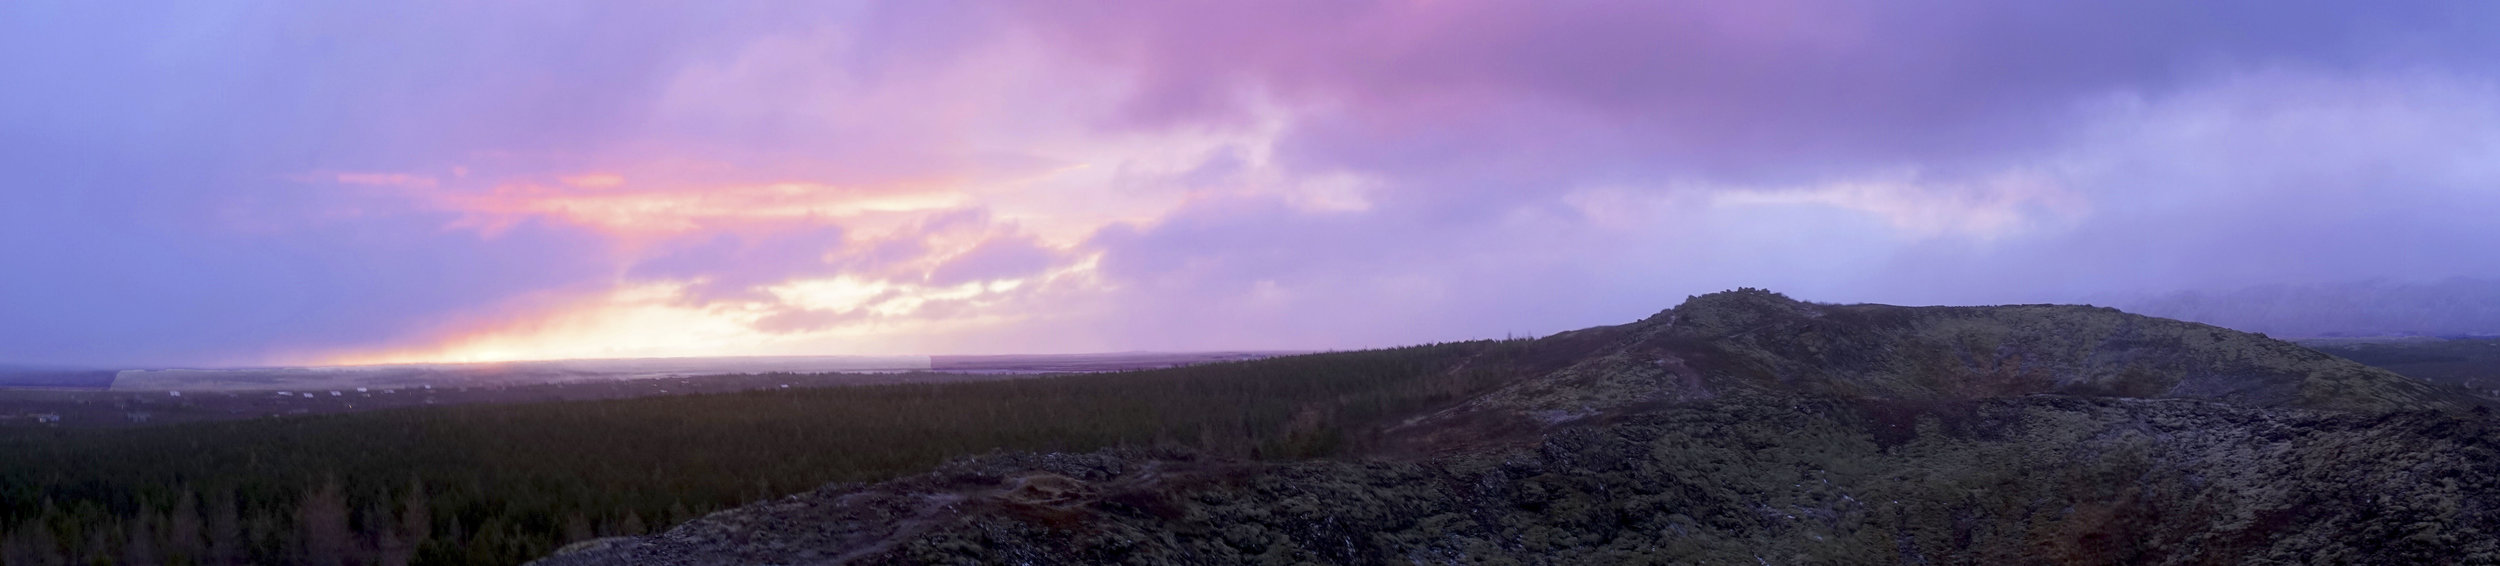 Krity S x Iceland 2018_30.jpg